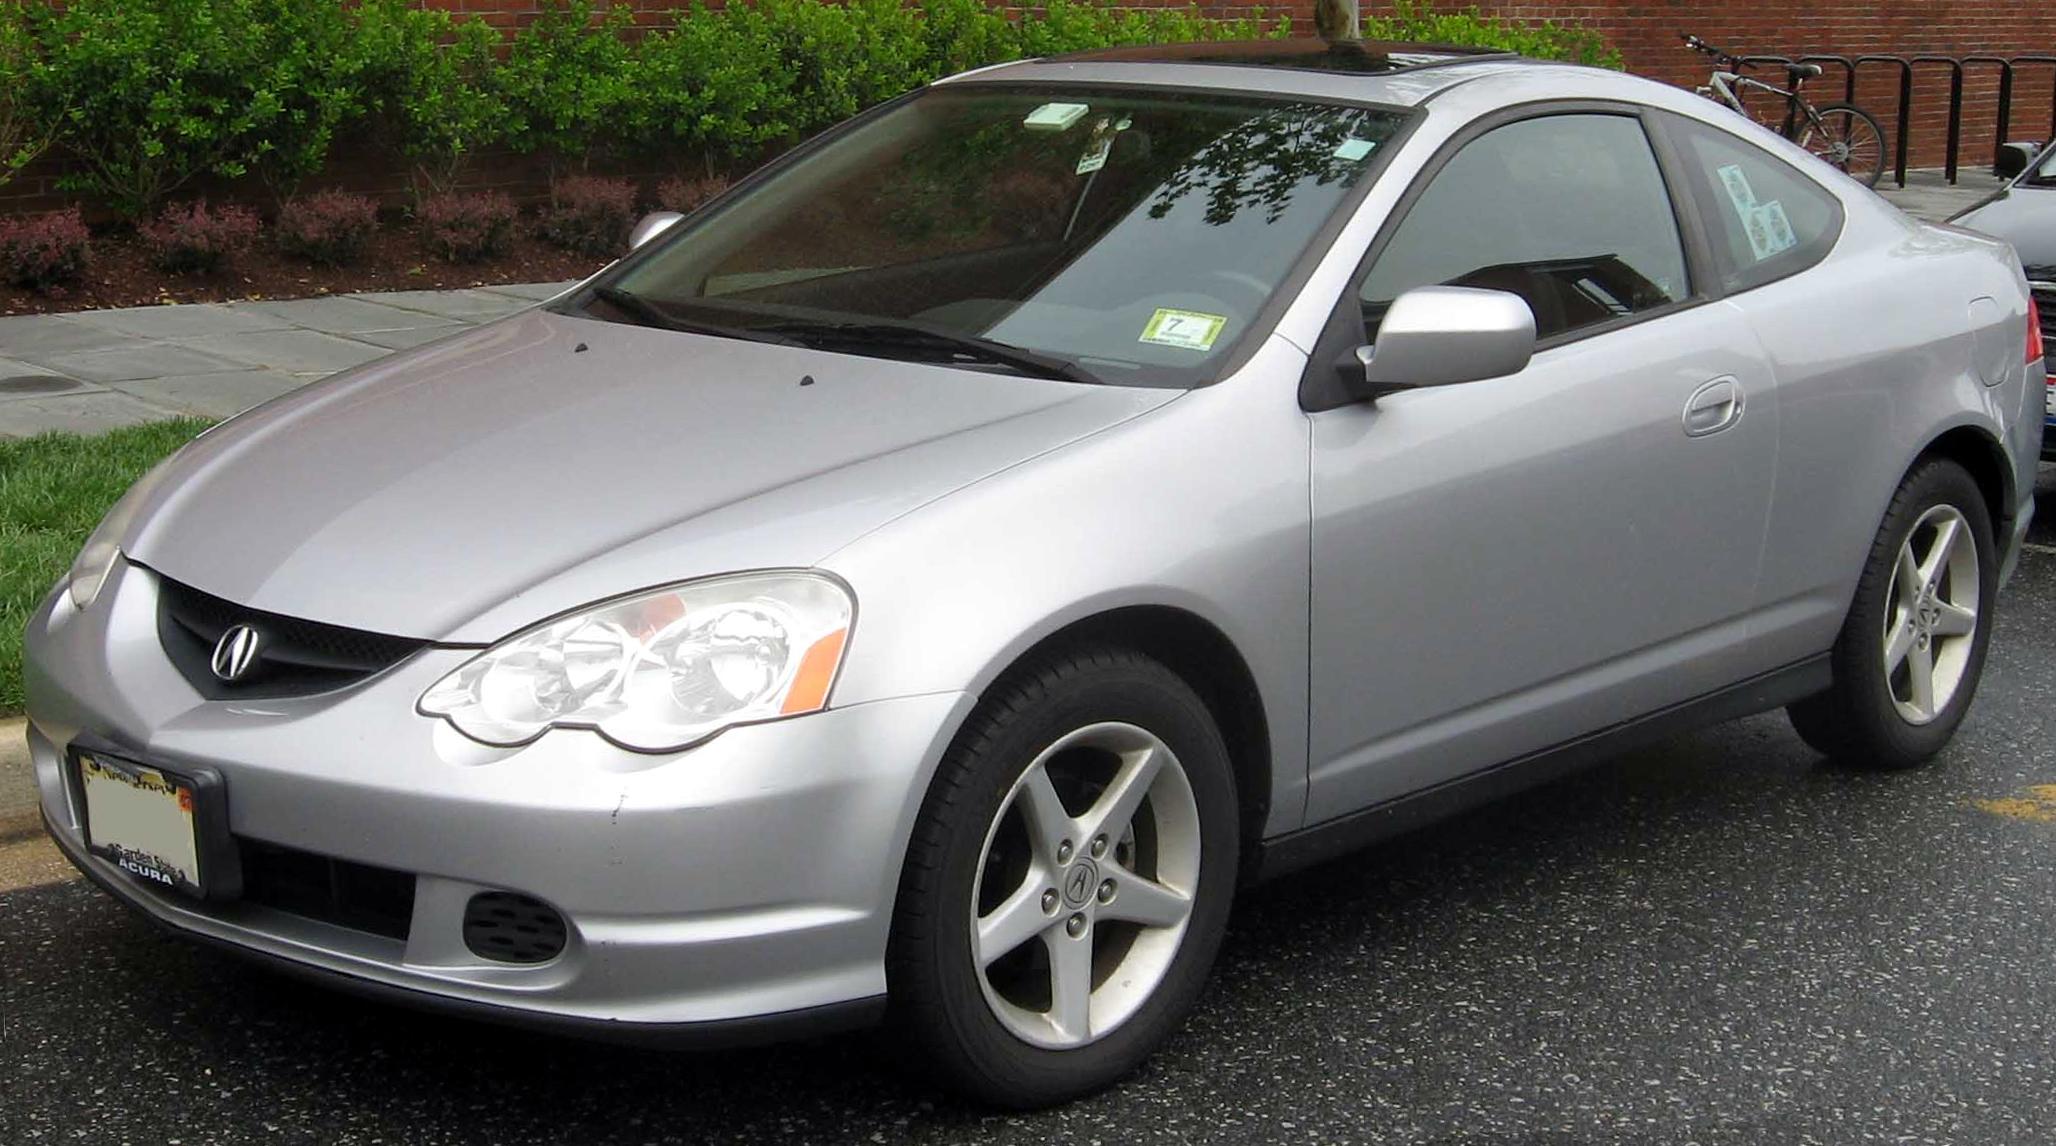 File:2002-04 Acura RSX.jpg